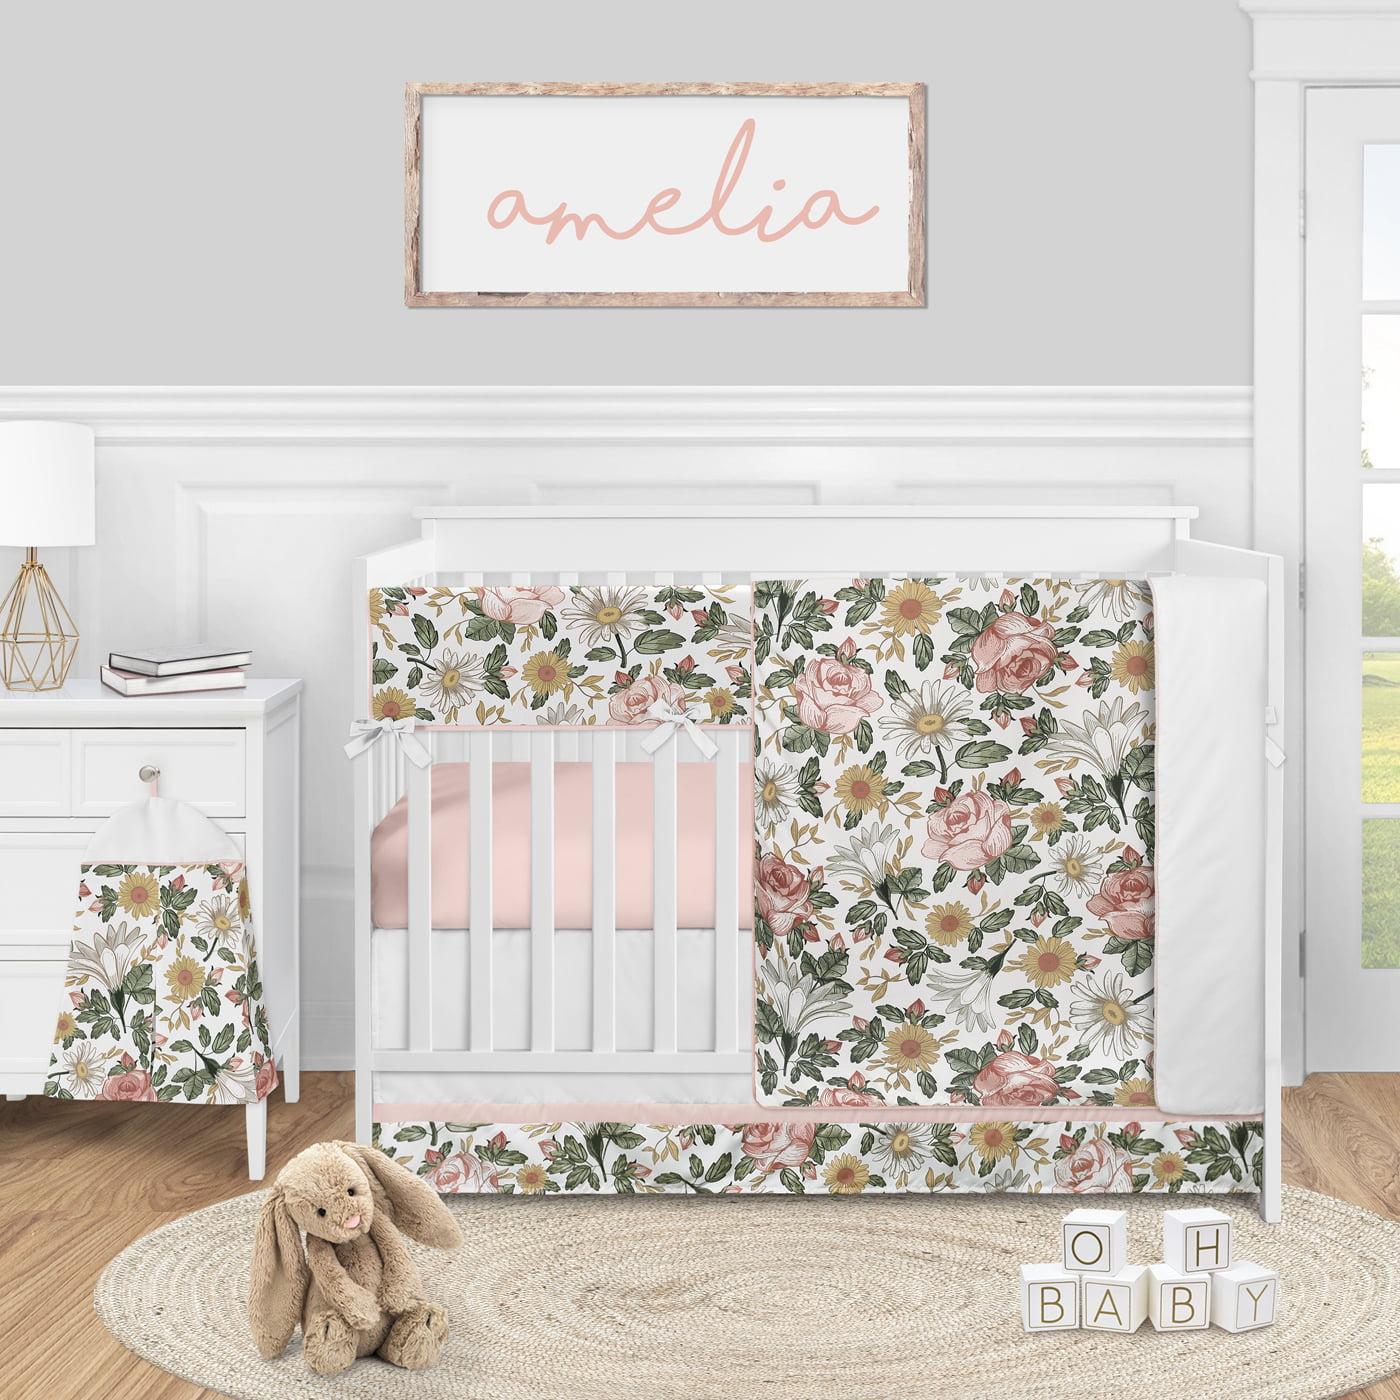 Sweet Jojo Designs White Floral Rose Girl Baby Nursery Crib Bed Skirt Dust Ruffle Solid Flower Luxurious Elegant Princess Vintage Boho Shabby Chic Luxury Glam High End Roses